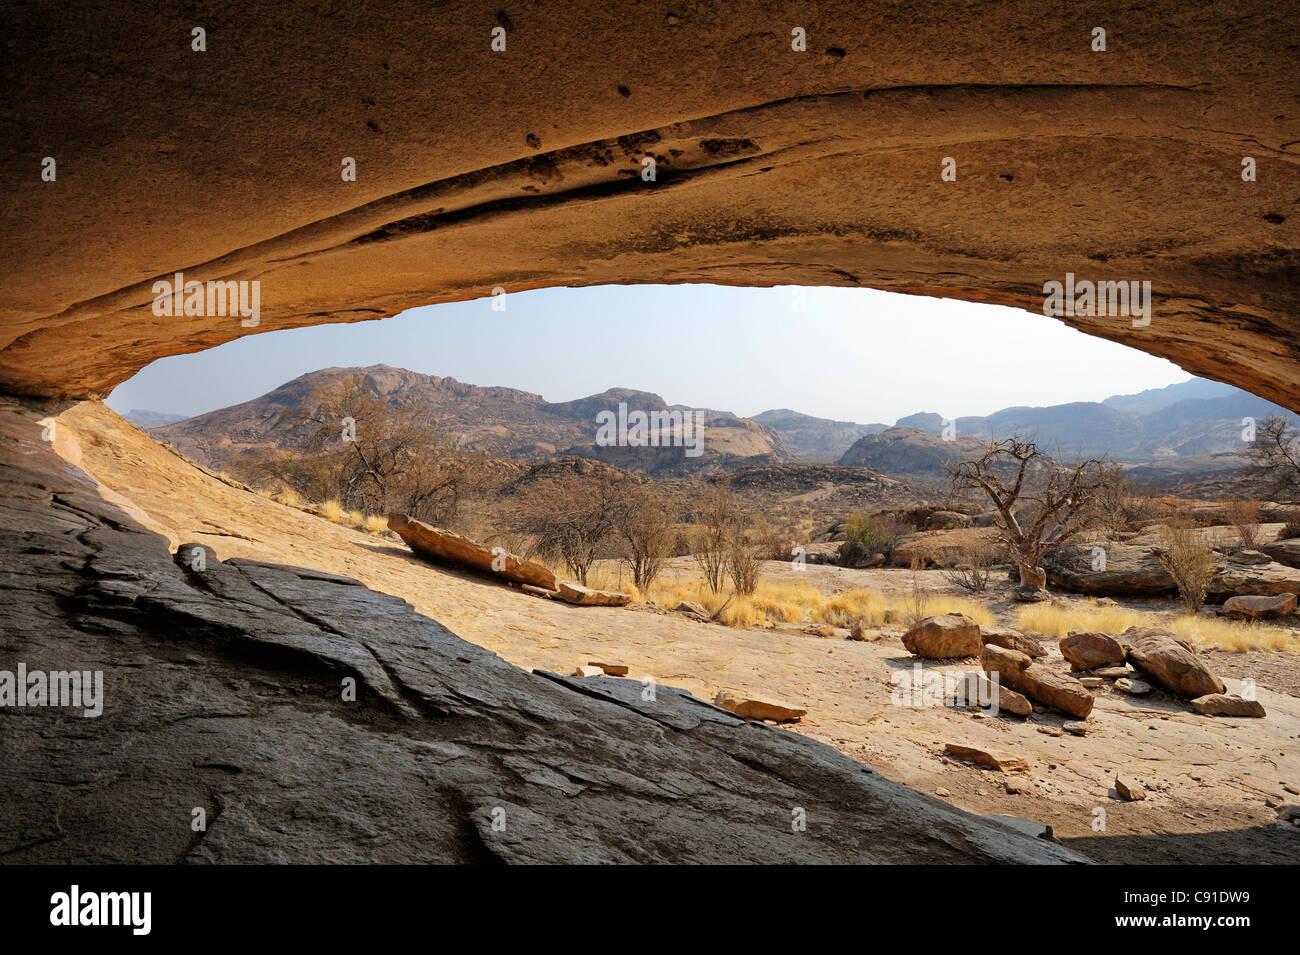 Rock Shelter Phillipp´s Höhle mit Aussicht über Savannah, Ameib, Erongo Berge, Namibia Stockbild